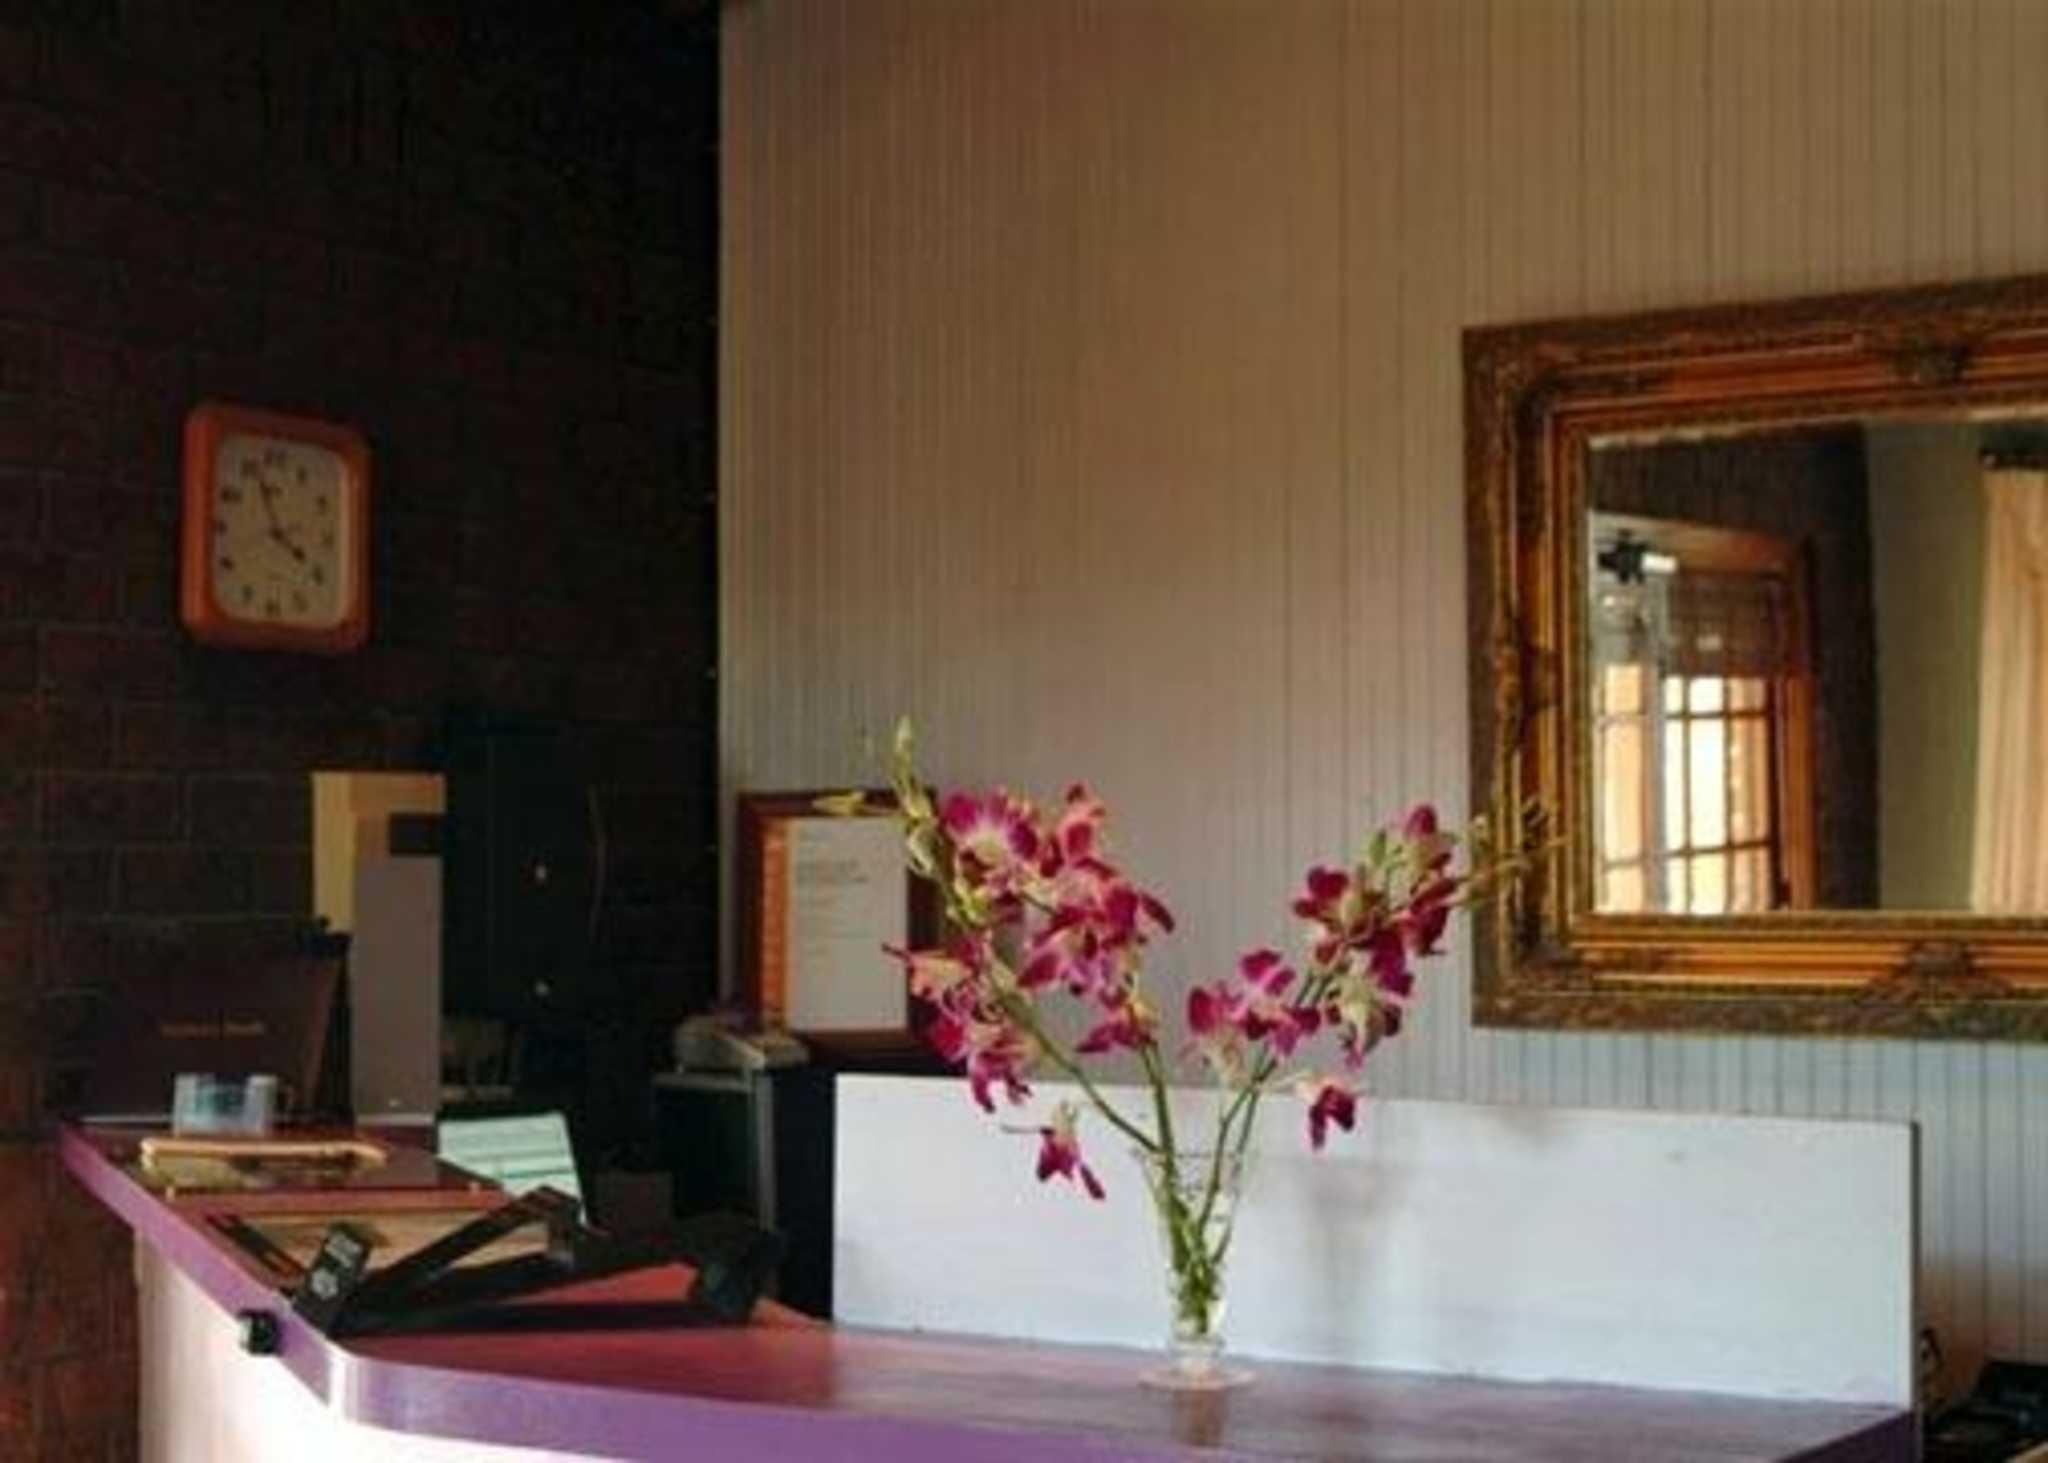 Econo Lodge Goldfields - Stawell, VIC 3380 - (03) 5358 2911 | ShowMeLocal.com